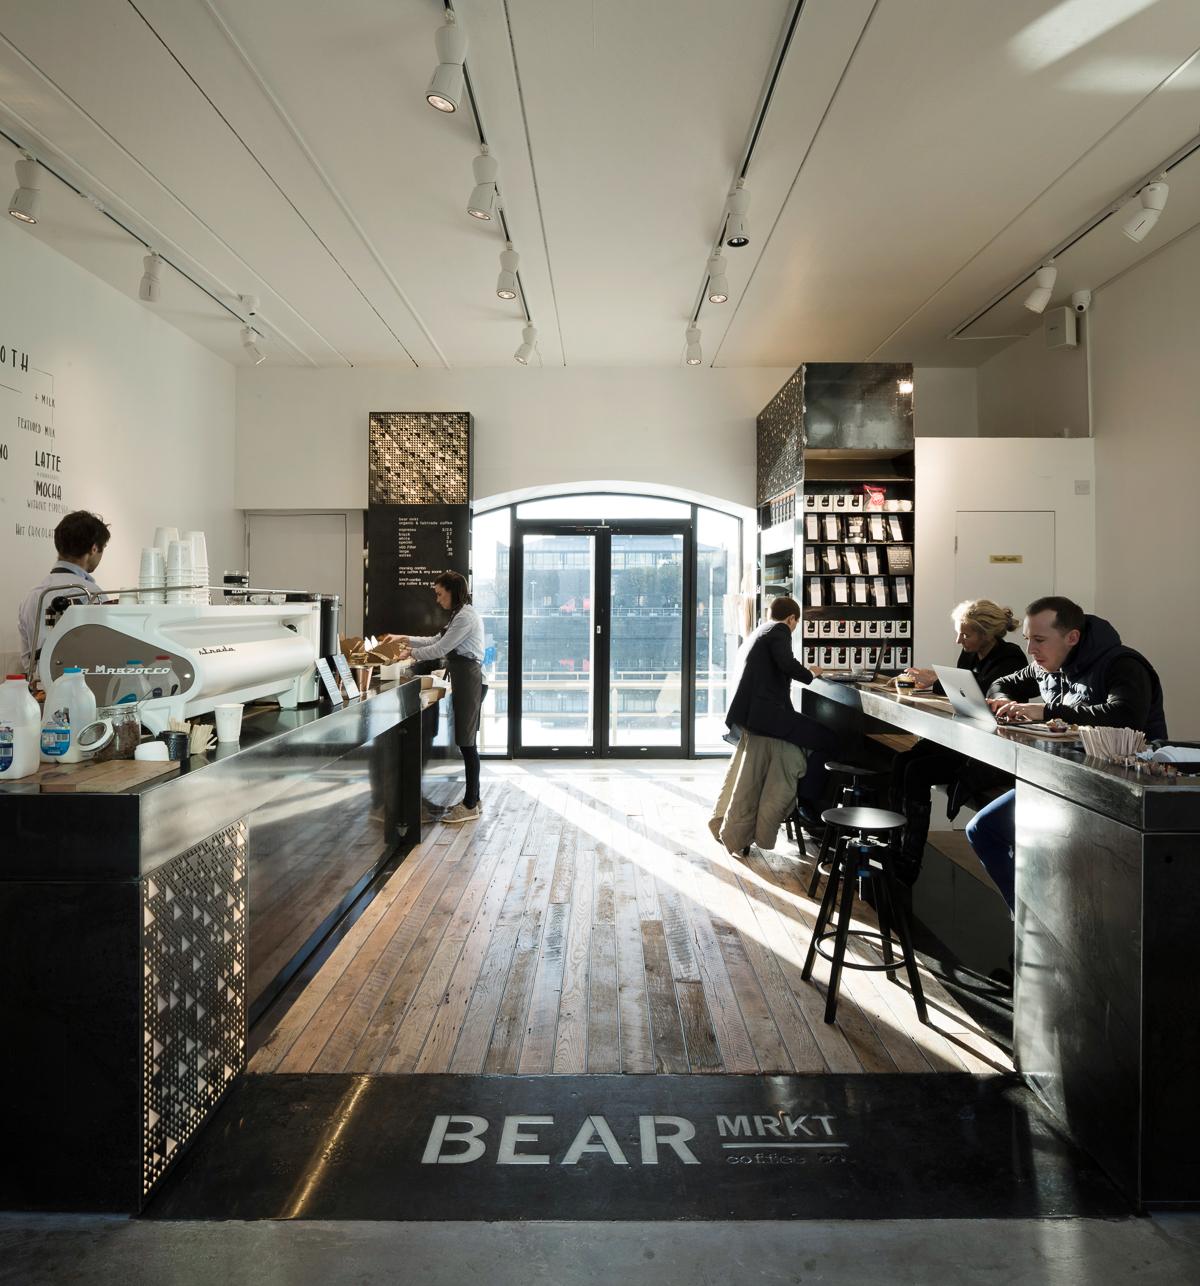 A_MC_DUA_Bear_view 1_WEB.jpg